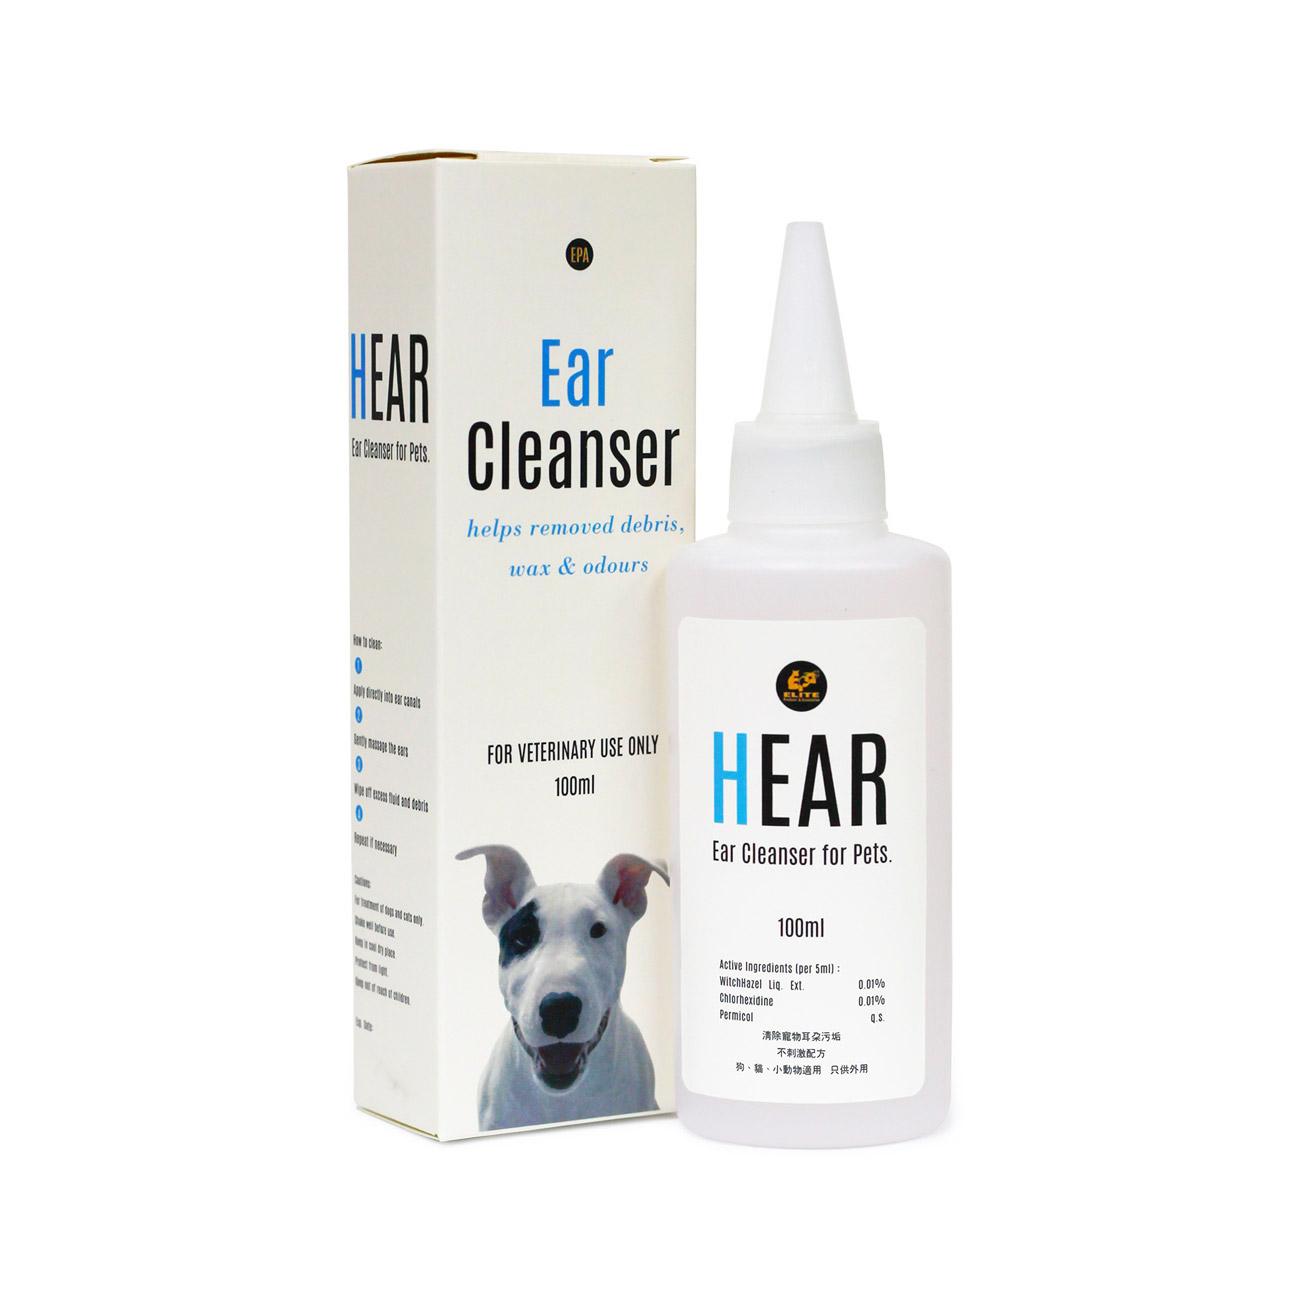 Ear Cleansing 100ml